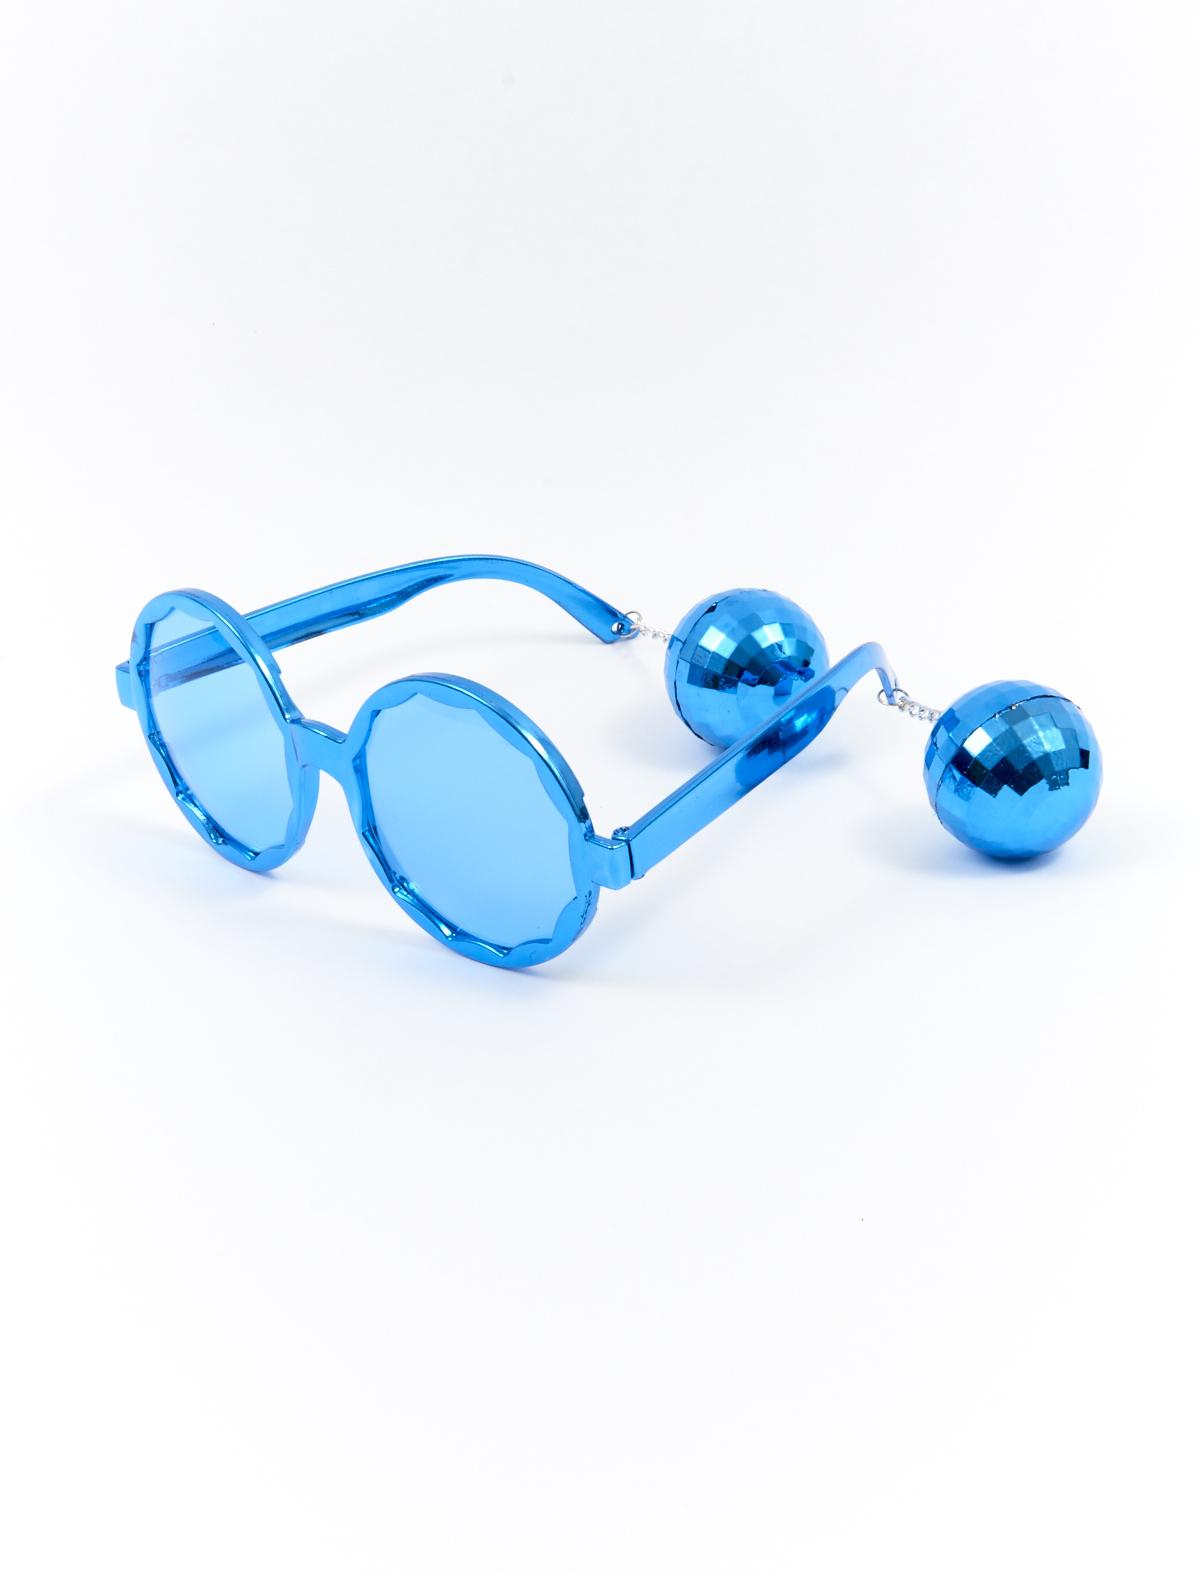 Brille mit Discokugel blau